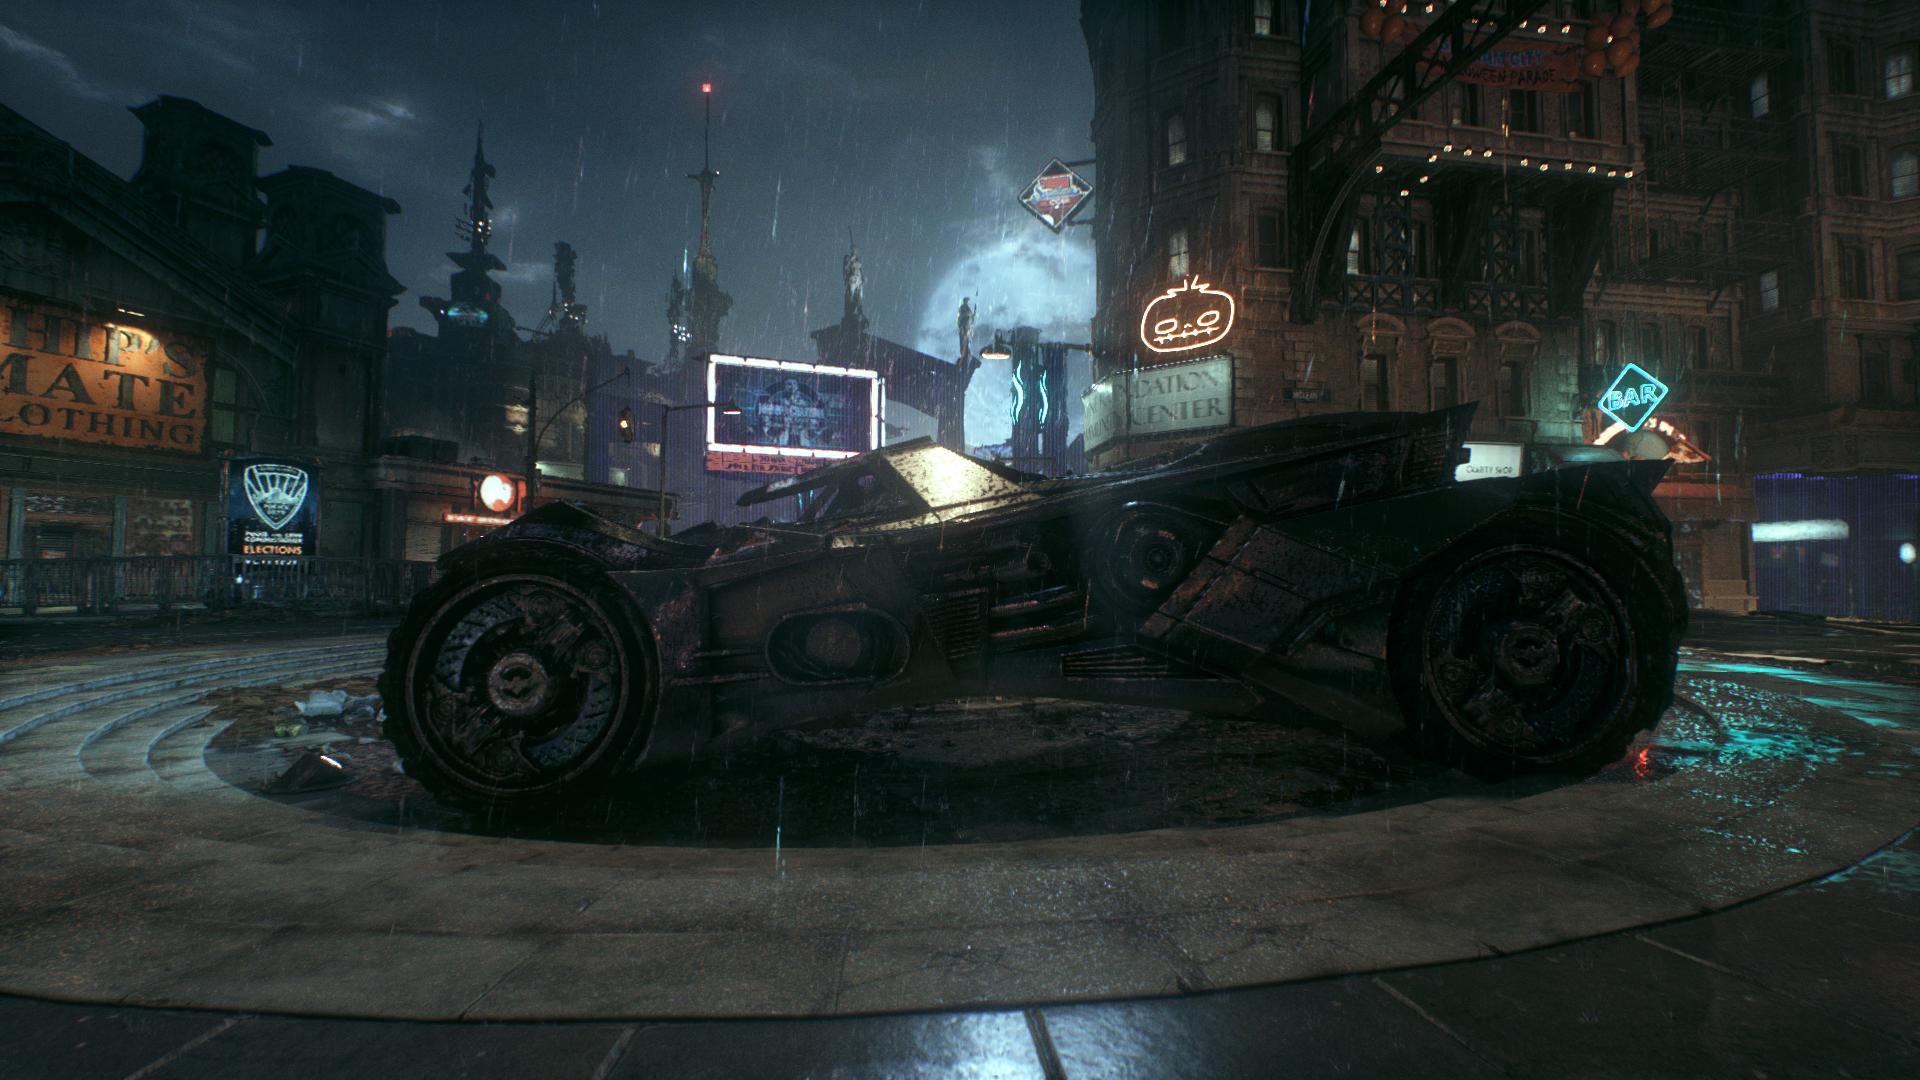 Magic Of Rocksteadys World Design In Batman Arkham Knight Resetera Return To Asylum Reg 3 Ps4 Well It Looks Really Cool At Least